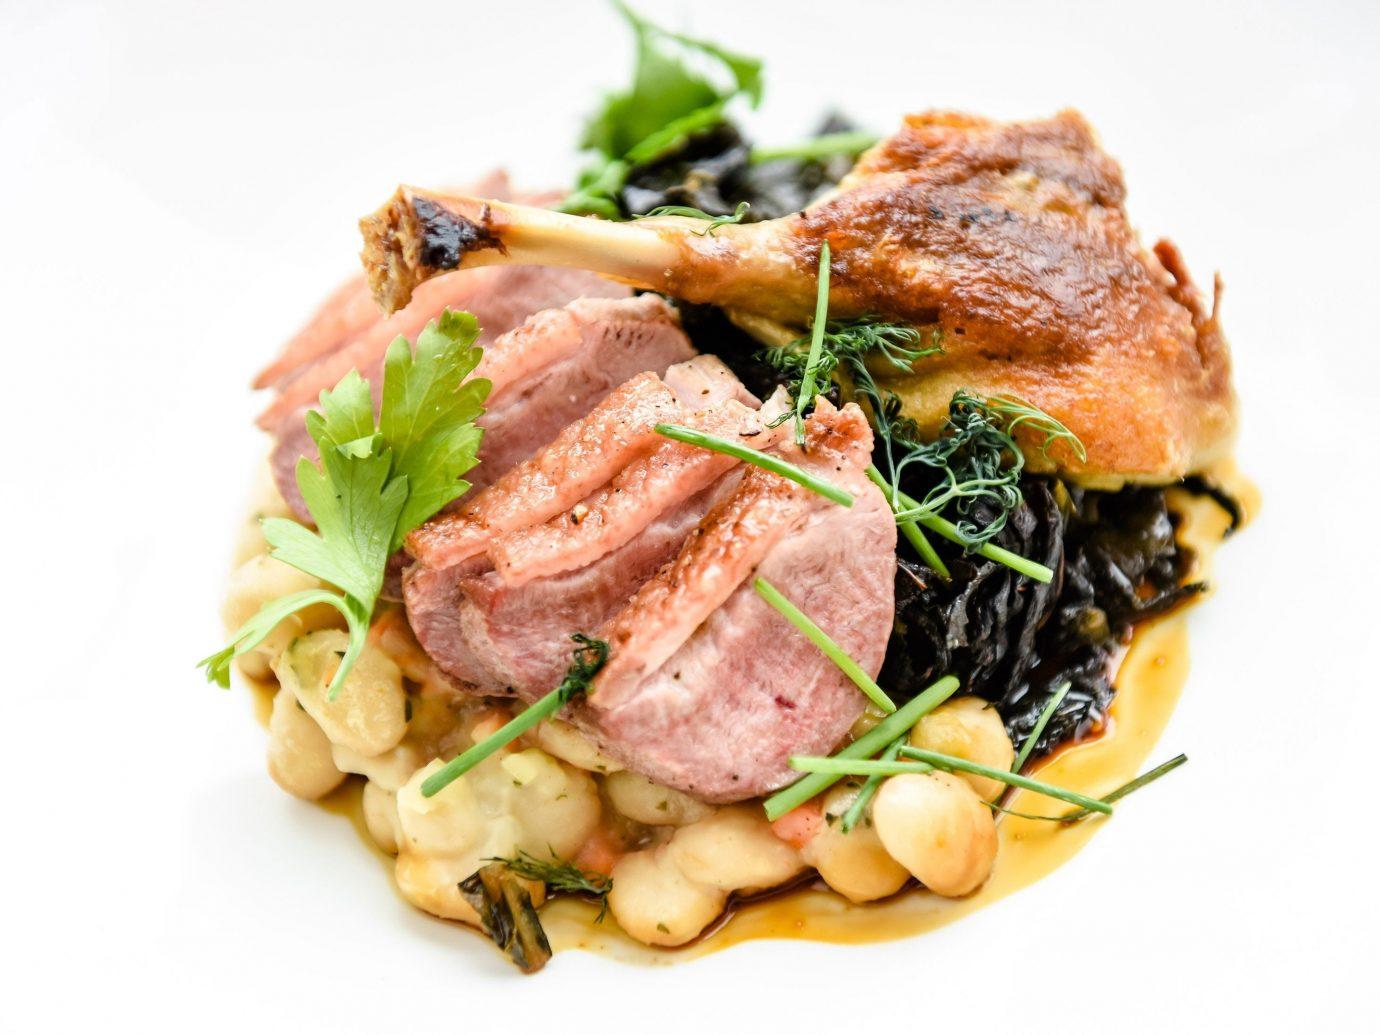 Food + Drink food dish plate meat cuisine produce vegetable steak veal pork chop meal pasta piece de resistance